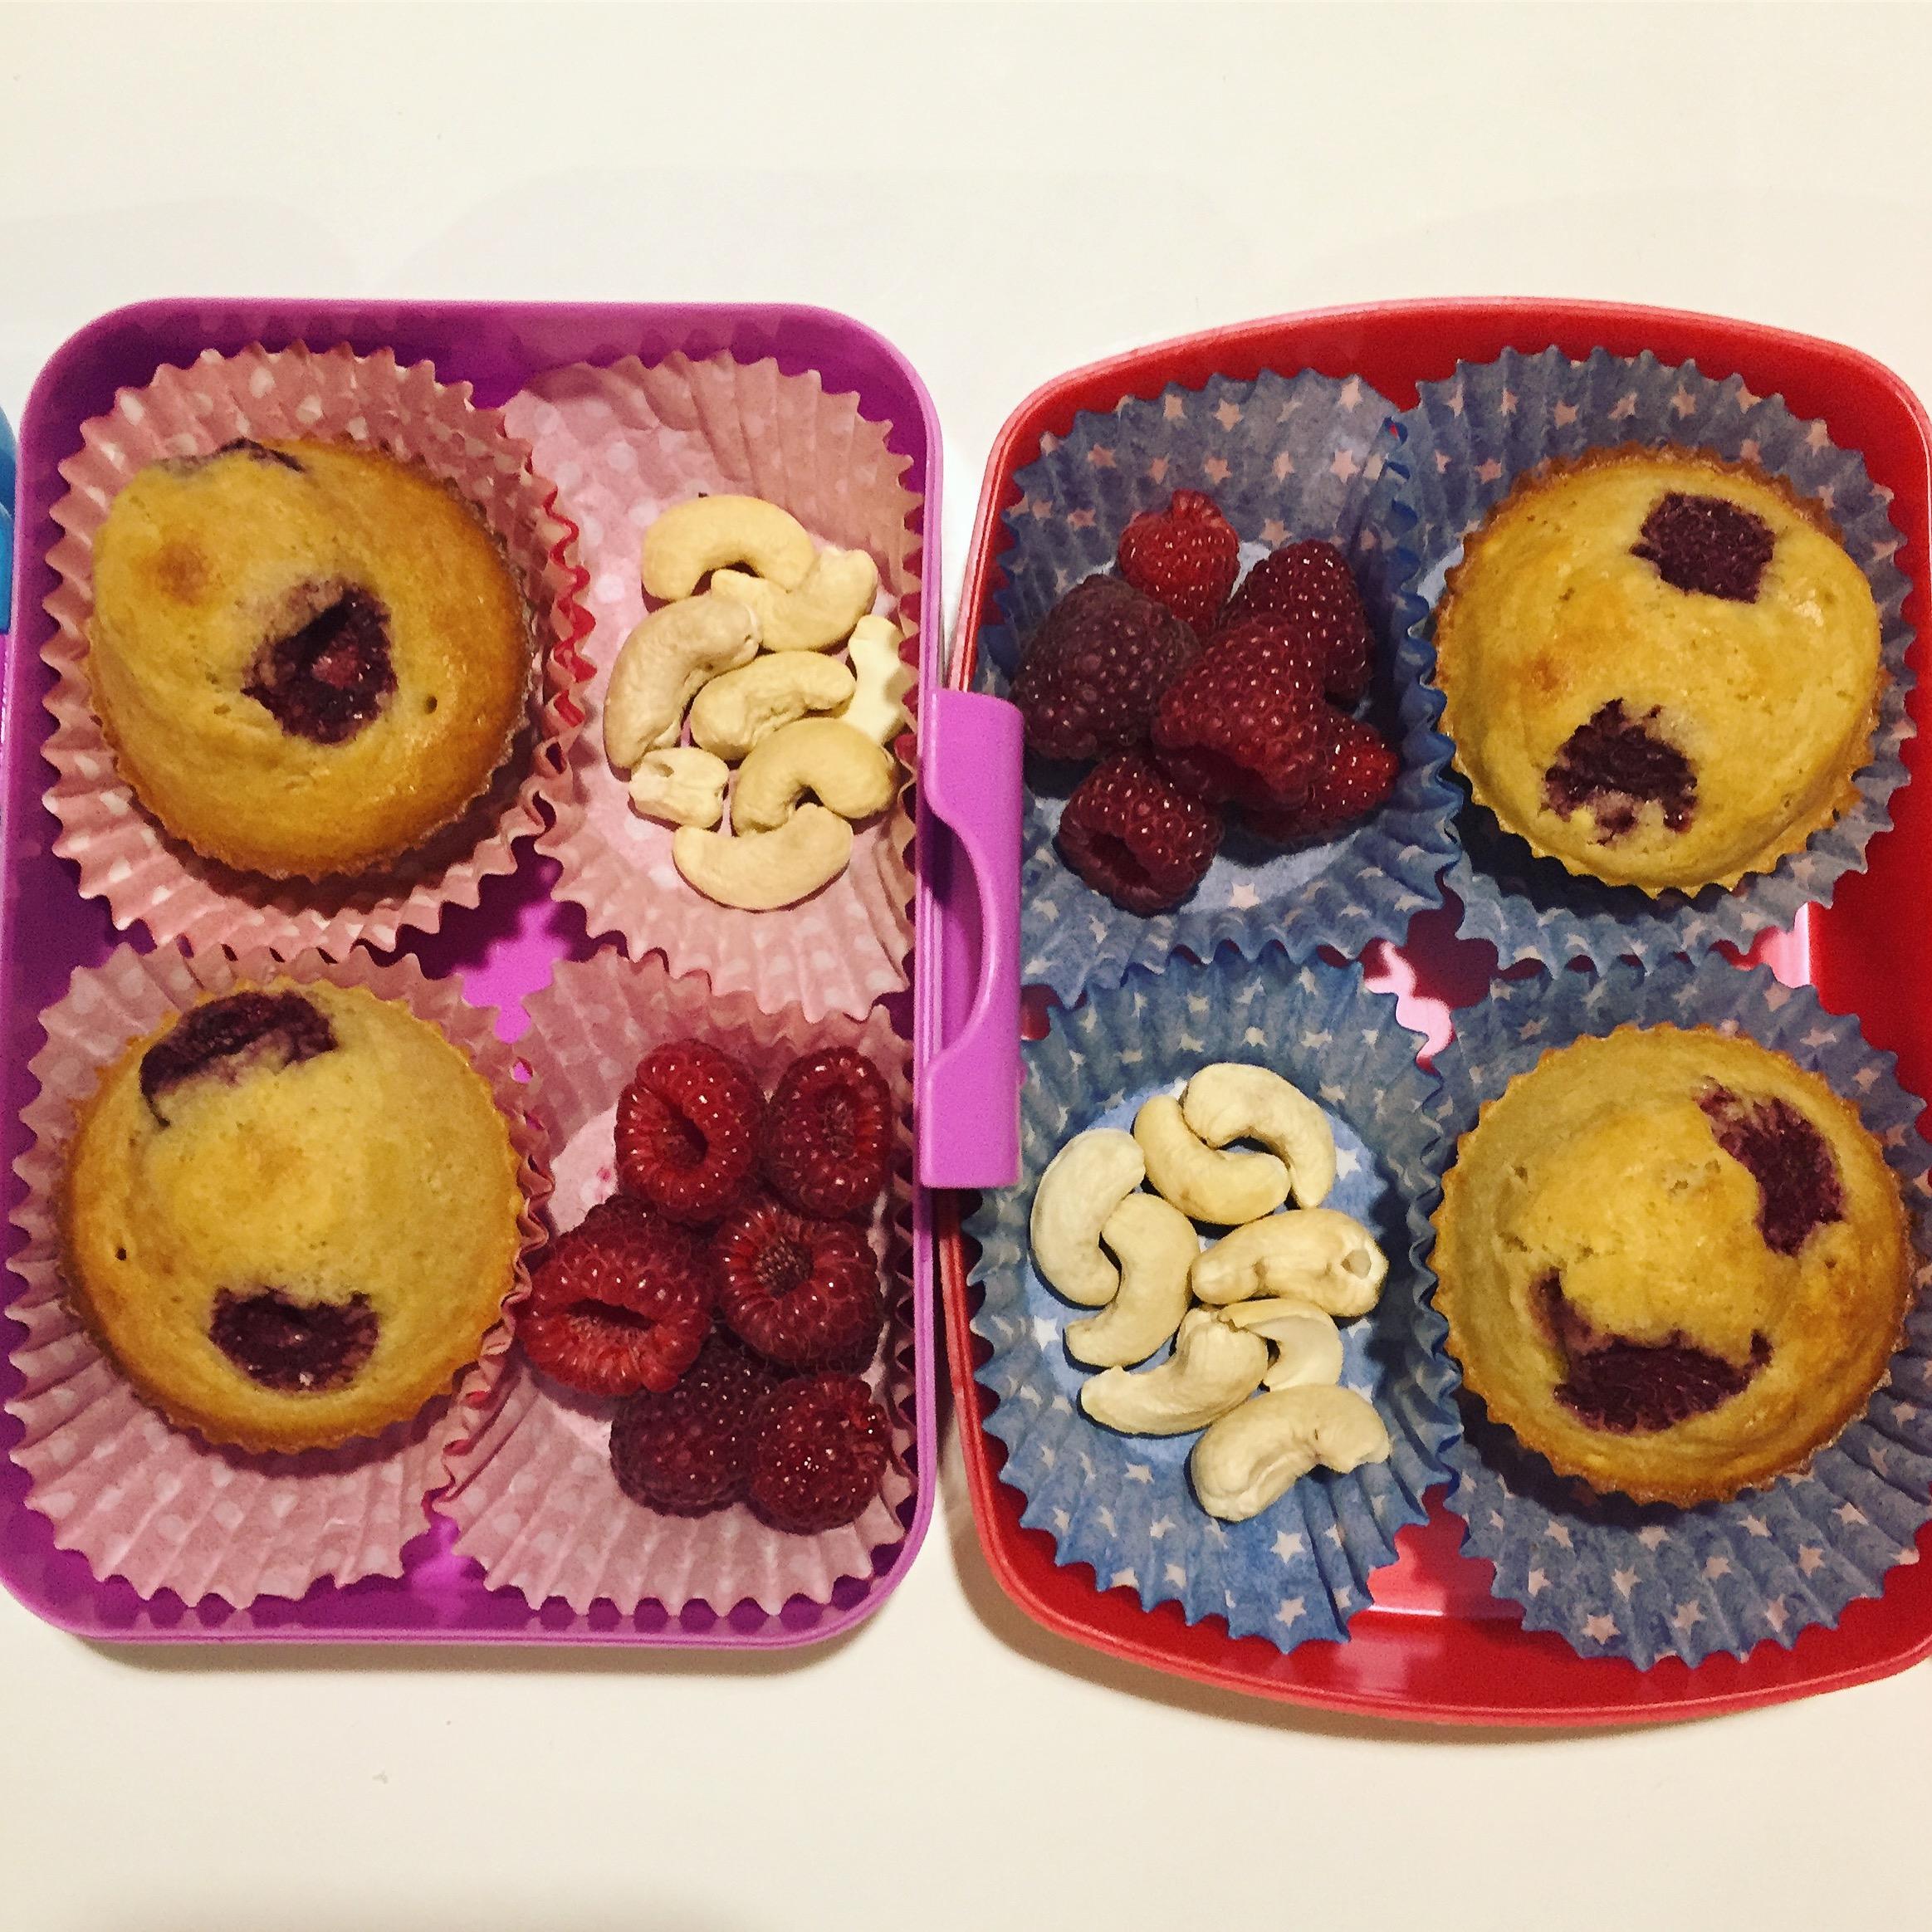 Jaglane muffinki z owocami